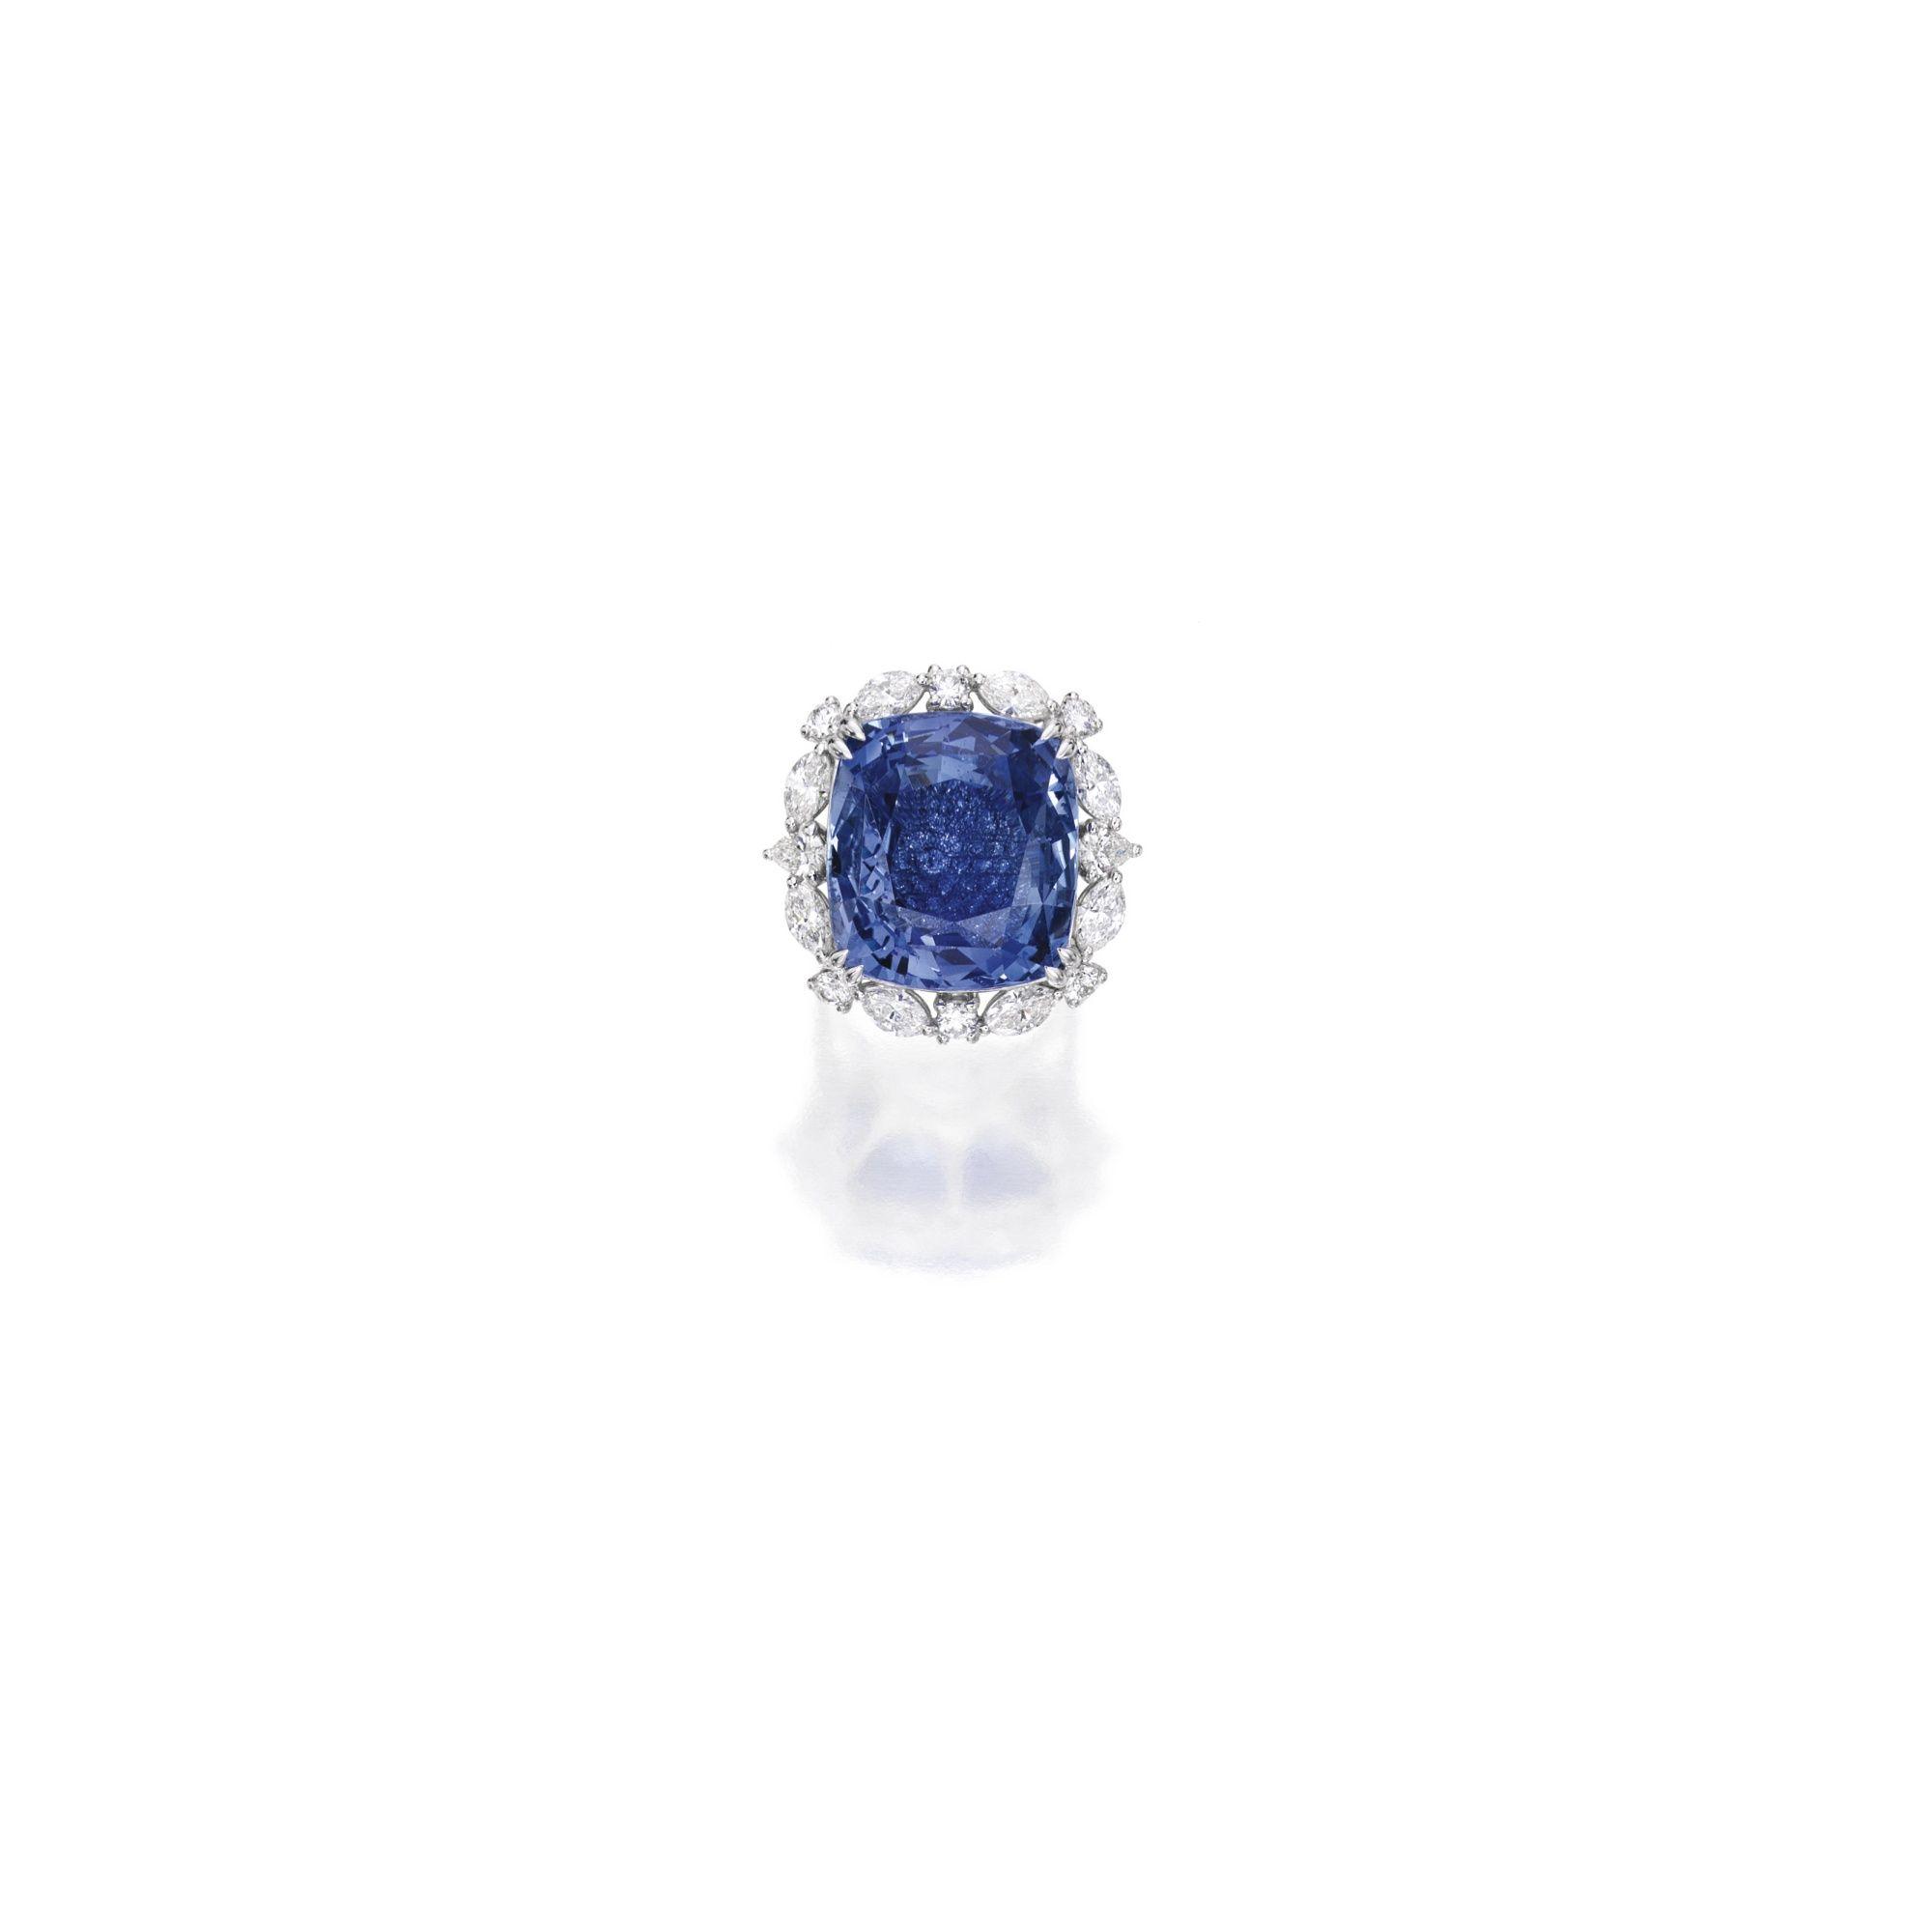 Alexander Laut 18K White Gold Round Blue Sapphire Ring with Diamonds Xp2eAVG